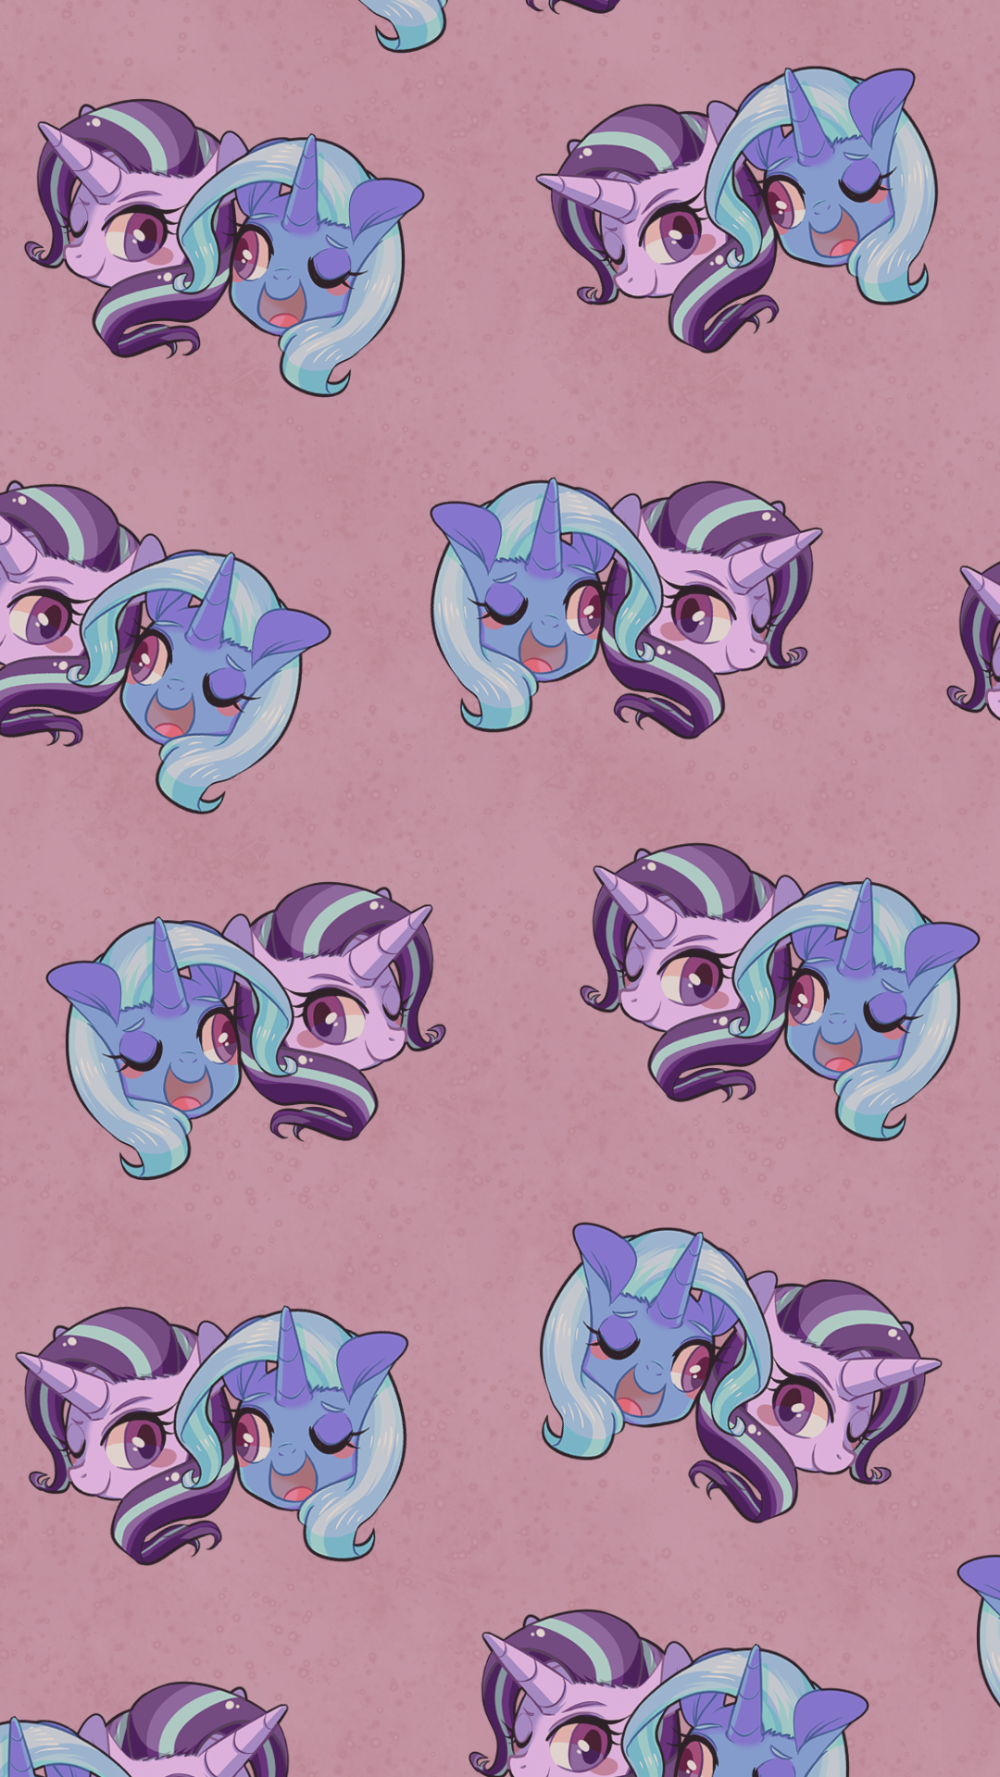 1468799 Artist Phyllismi Cute Diatrixes Glimmerbetes One Eye Closed Pony Safe Starlight Glimm My Little Pony Wallpaper Pony My Little Pony Friendship